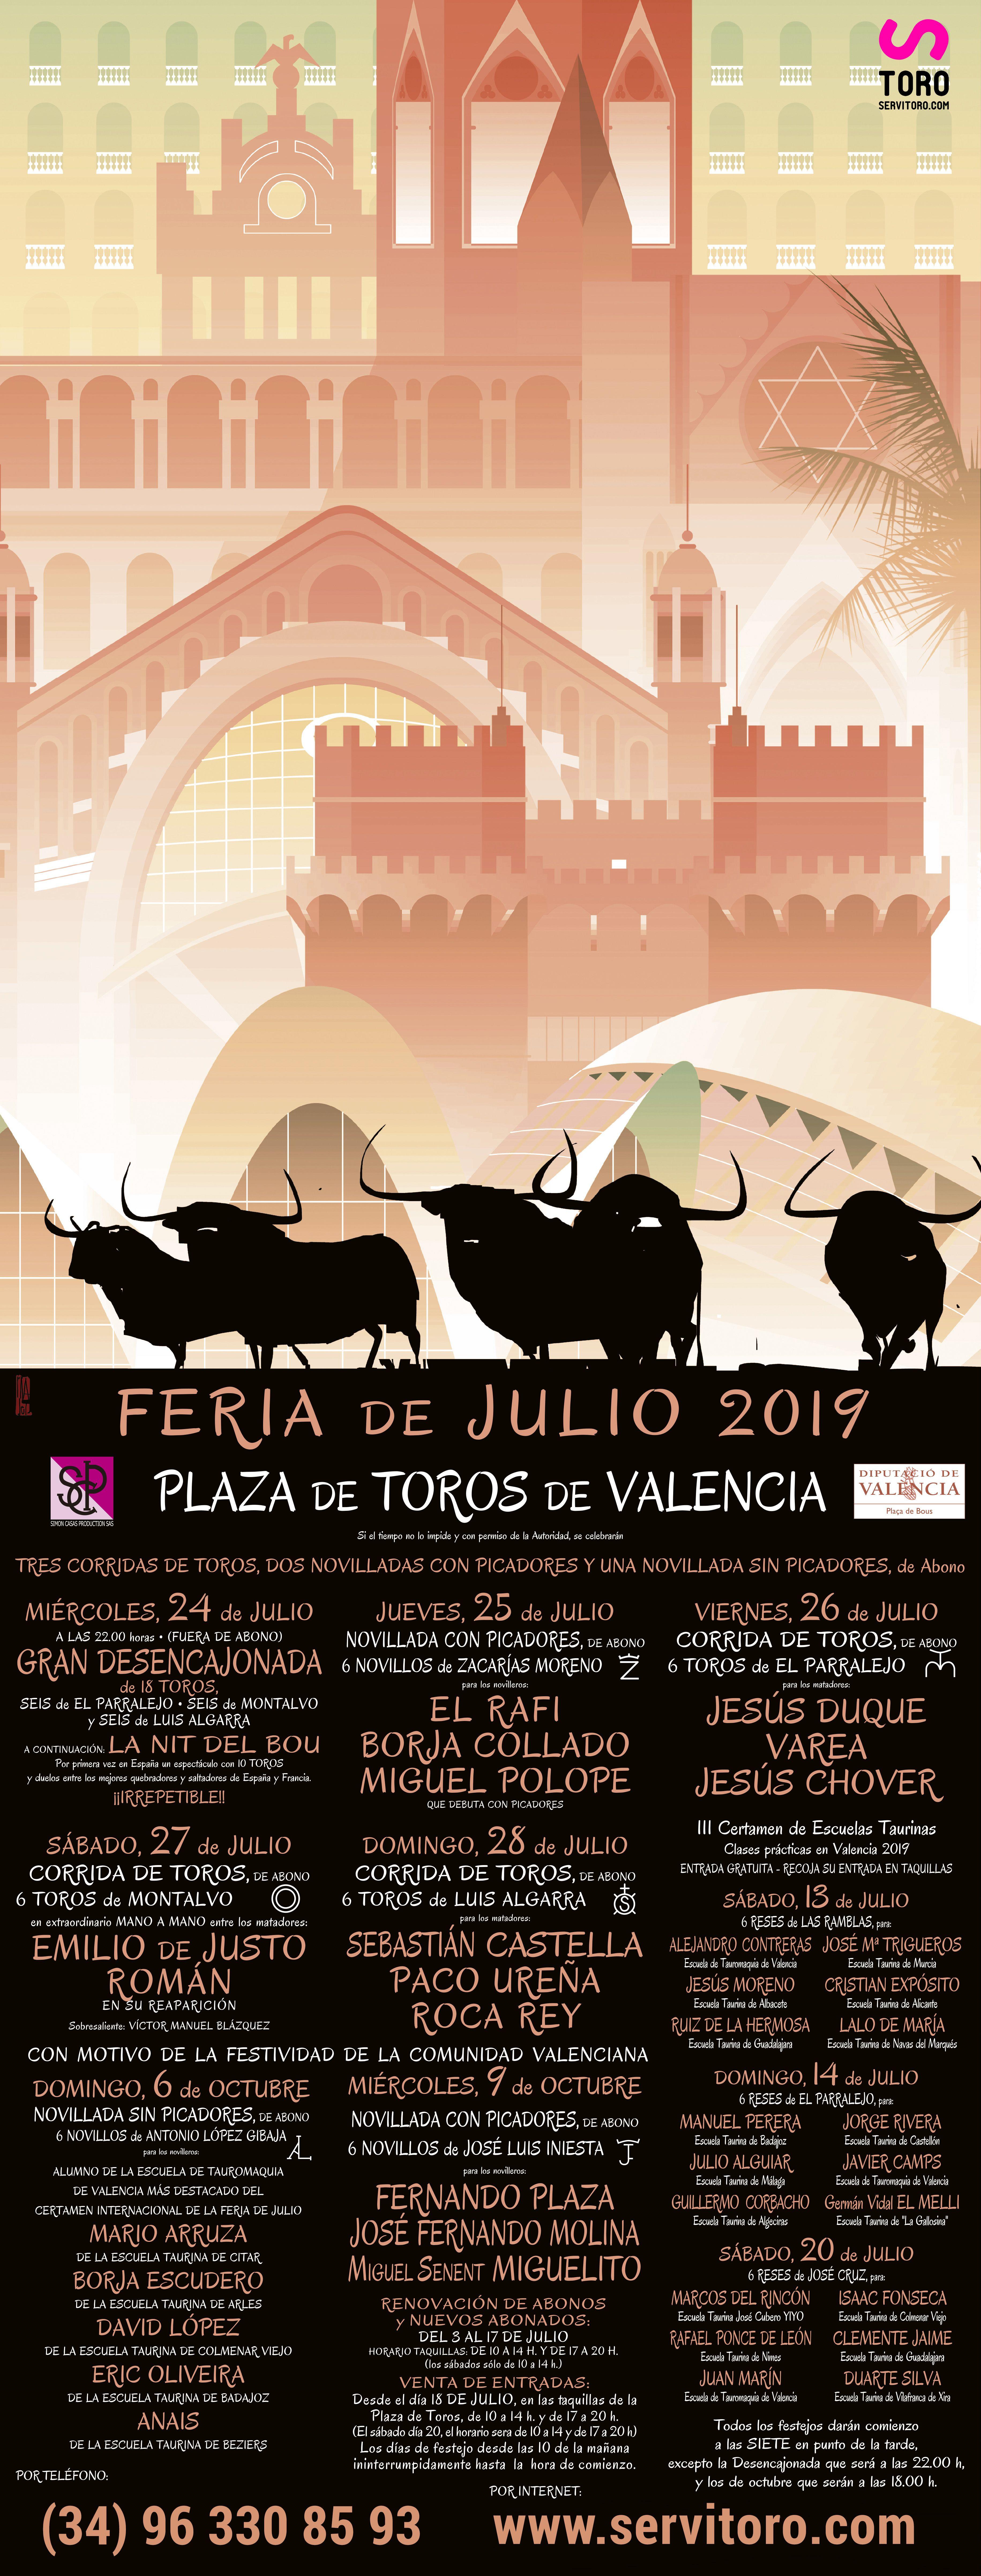 Plaza De Toros De Valencia Toros Plaza De Toros Feria Valencia